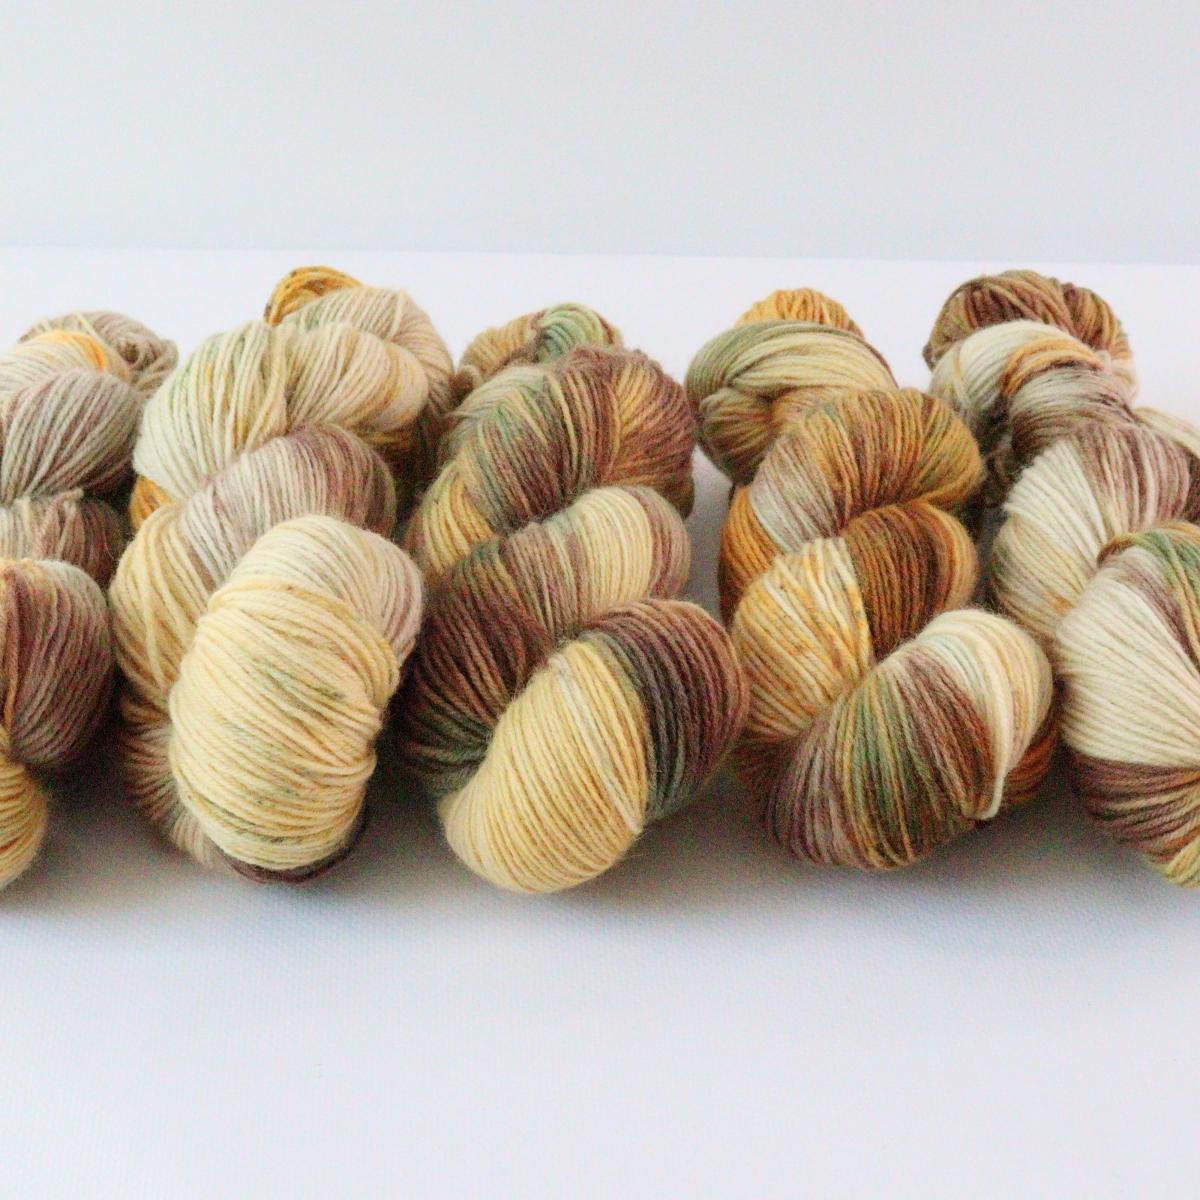 woodico.pro hand dyed yarn 088 3 1200x1200 - Hand dyed yarn / 088